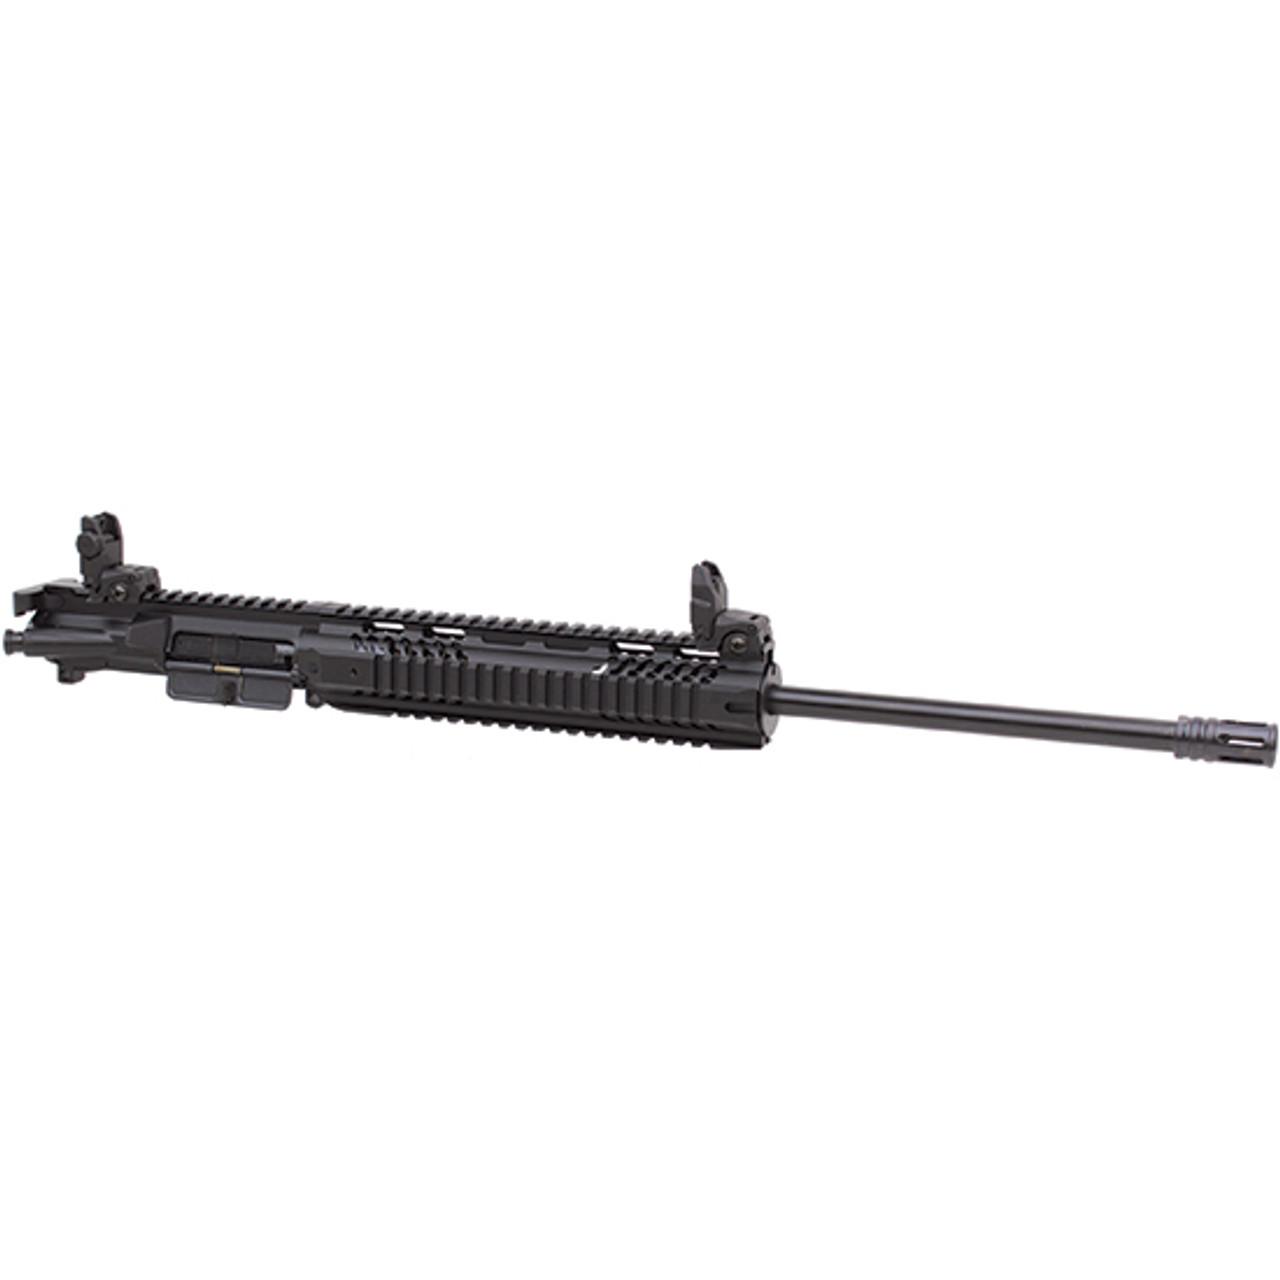 International Firearms  Complete Upper  18.5 Quad Rail CALIFORNIA LEGAL - .410